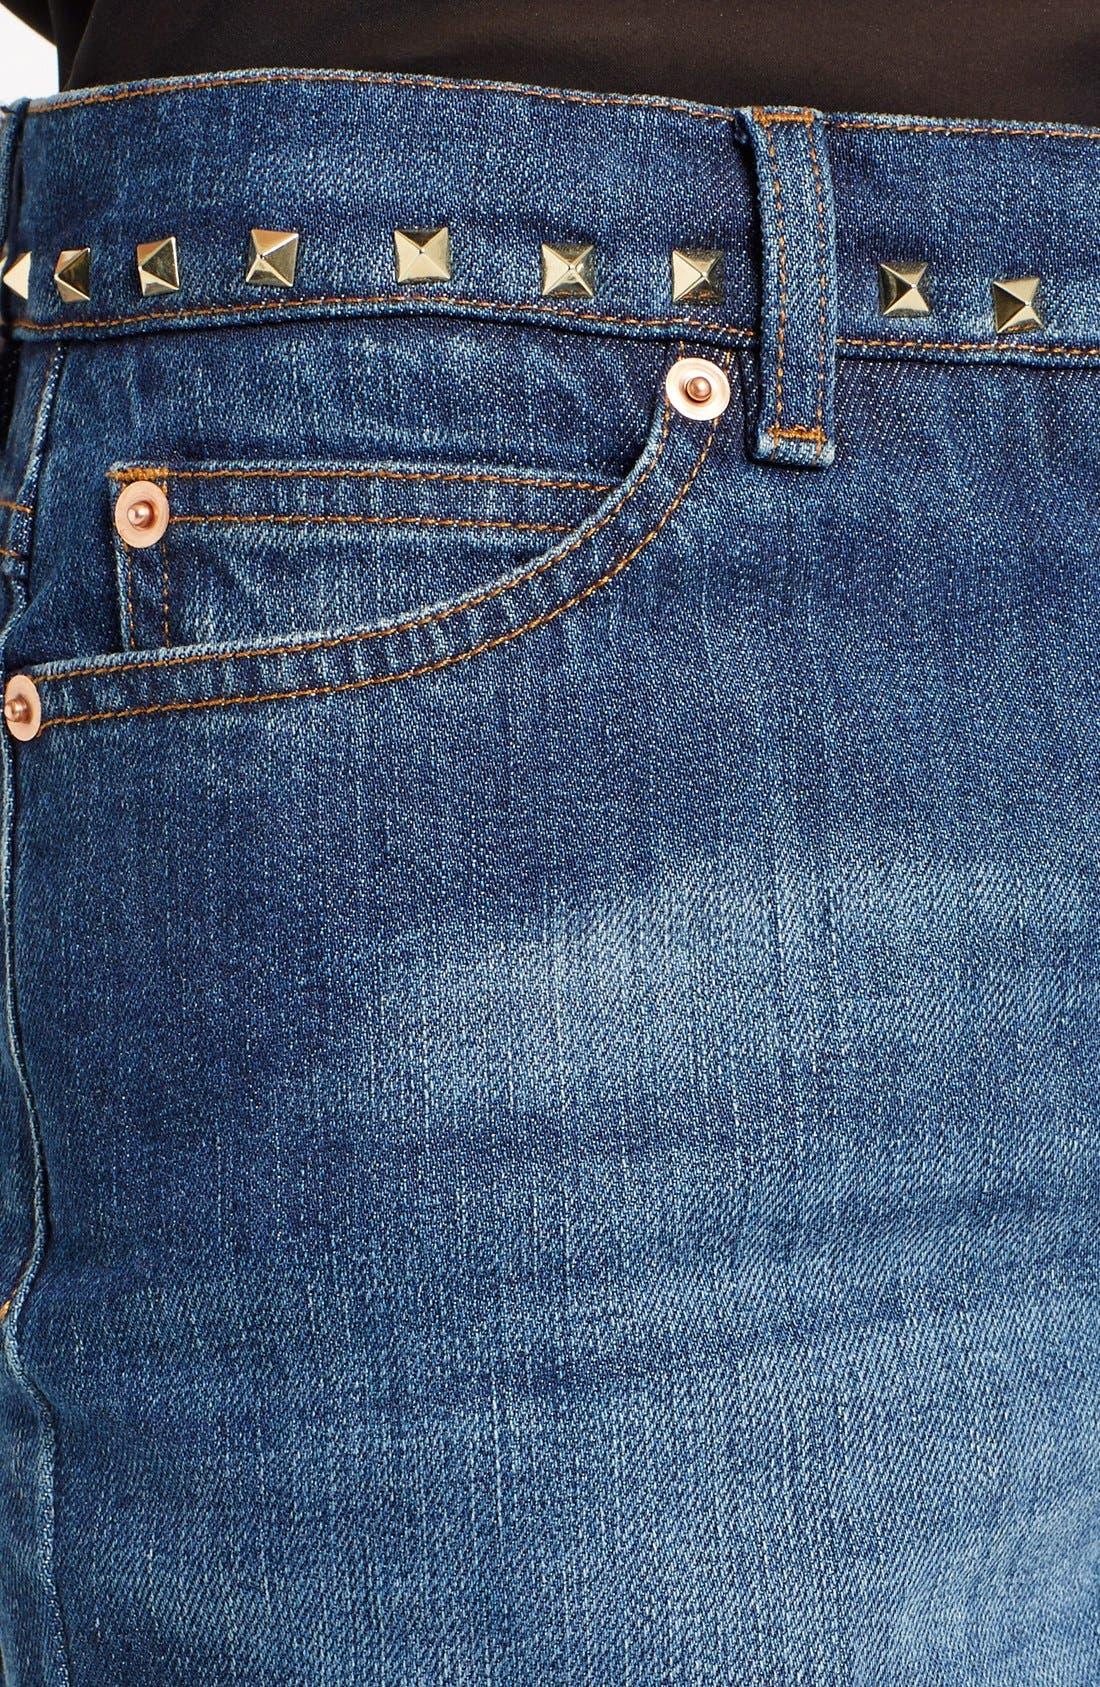 Studded Wide Leg Jeans,                             Alternate thumbnail 5, color,                             MEDIUM BLUE